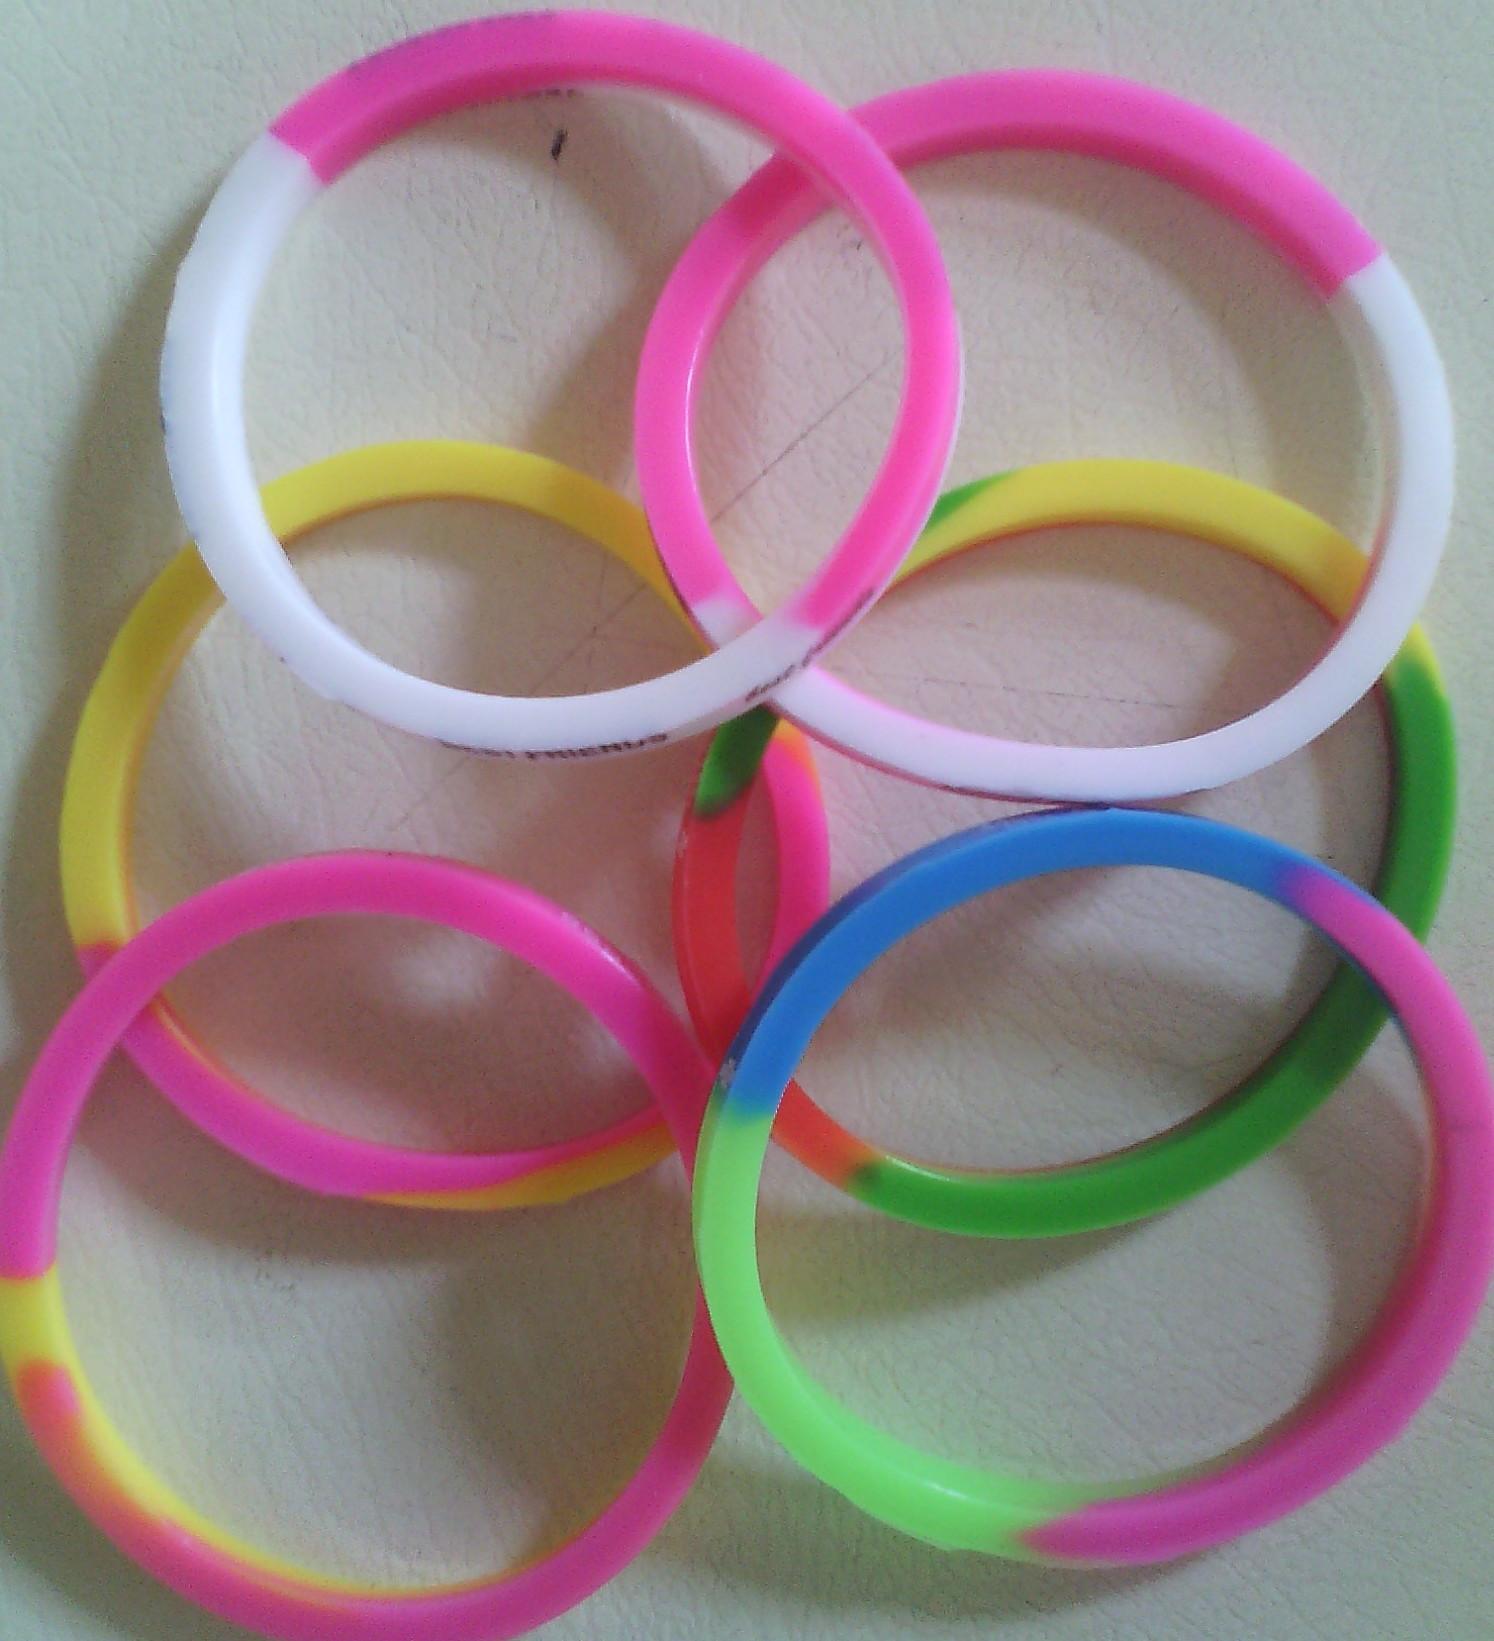 Bracelets Manufacturers Sourcing Suppliers